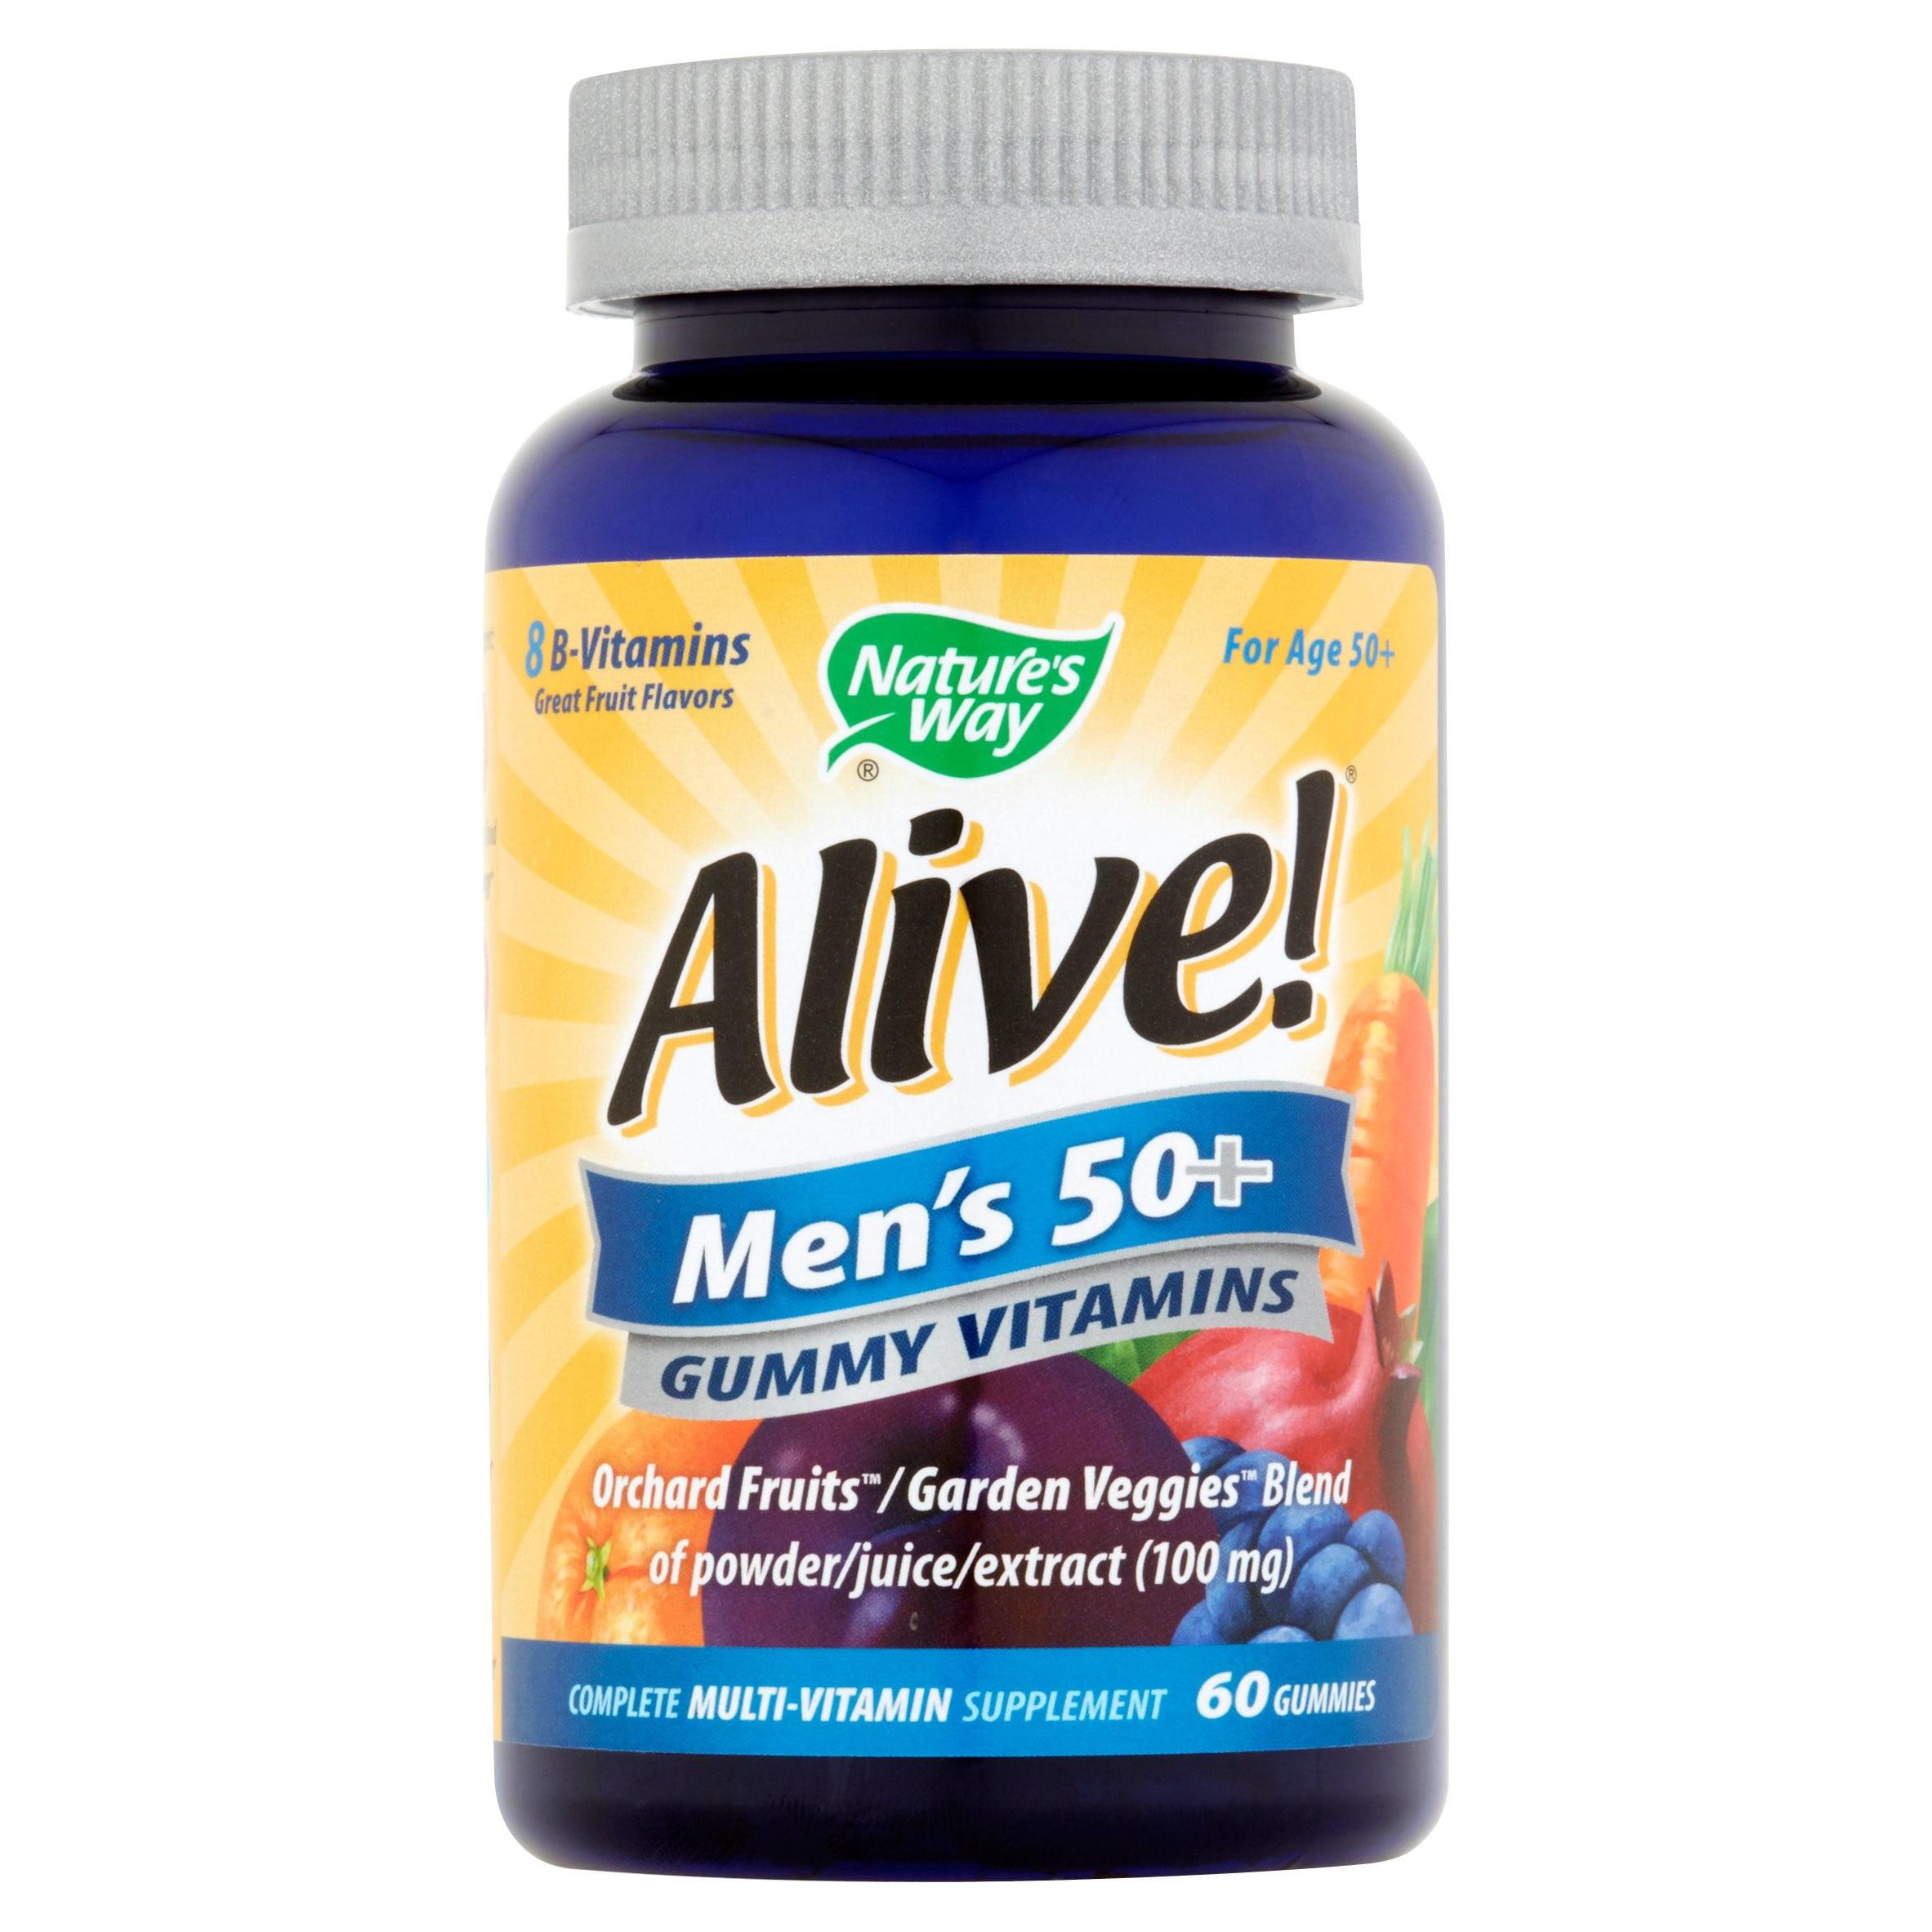 Natures Way Alive! Mens 50+ Gummy Vitamins Multivitamin Supplements 60 Count